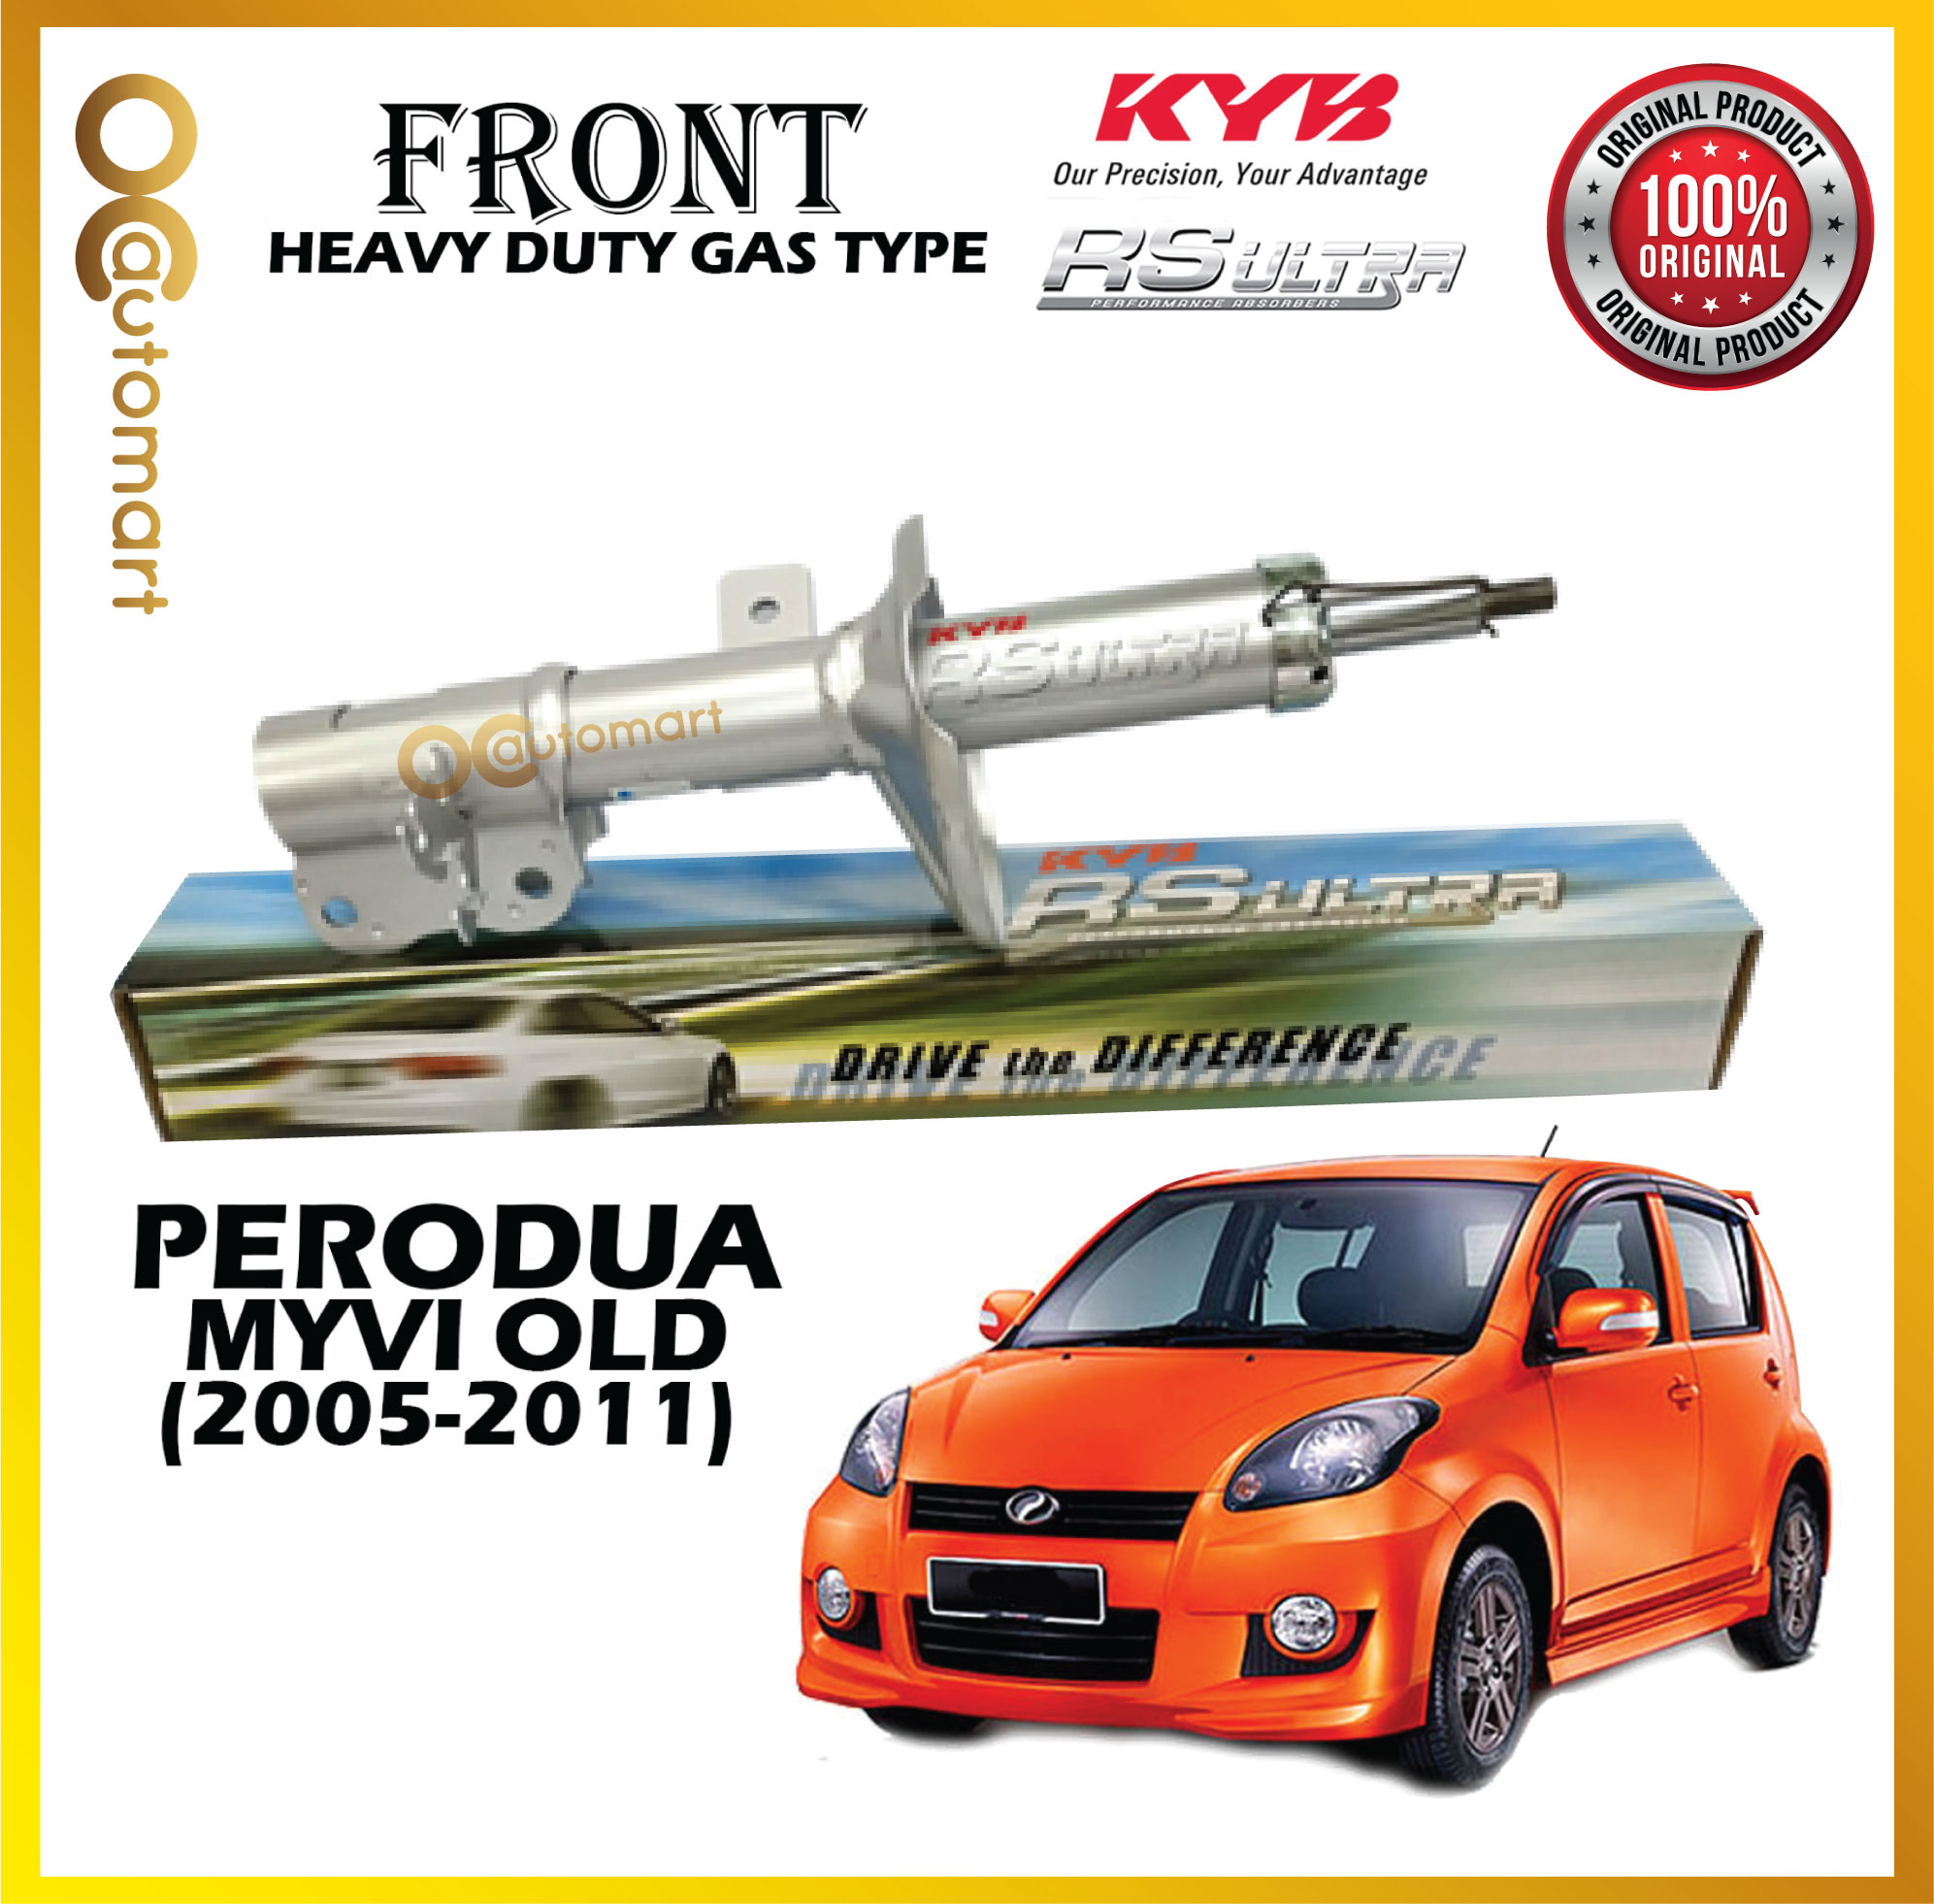 [1 PAIR] PERODUA MYVI FRONT & REAR SHOCK ABSORBER RS ULTRA ( HEAVY DUTY ) KAYABA KYB *ORIGINAL* (2005-2011)